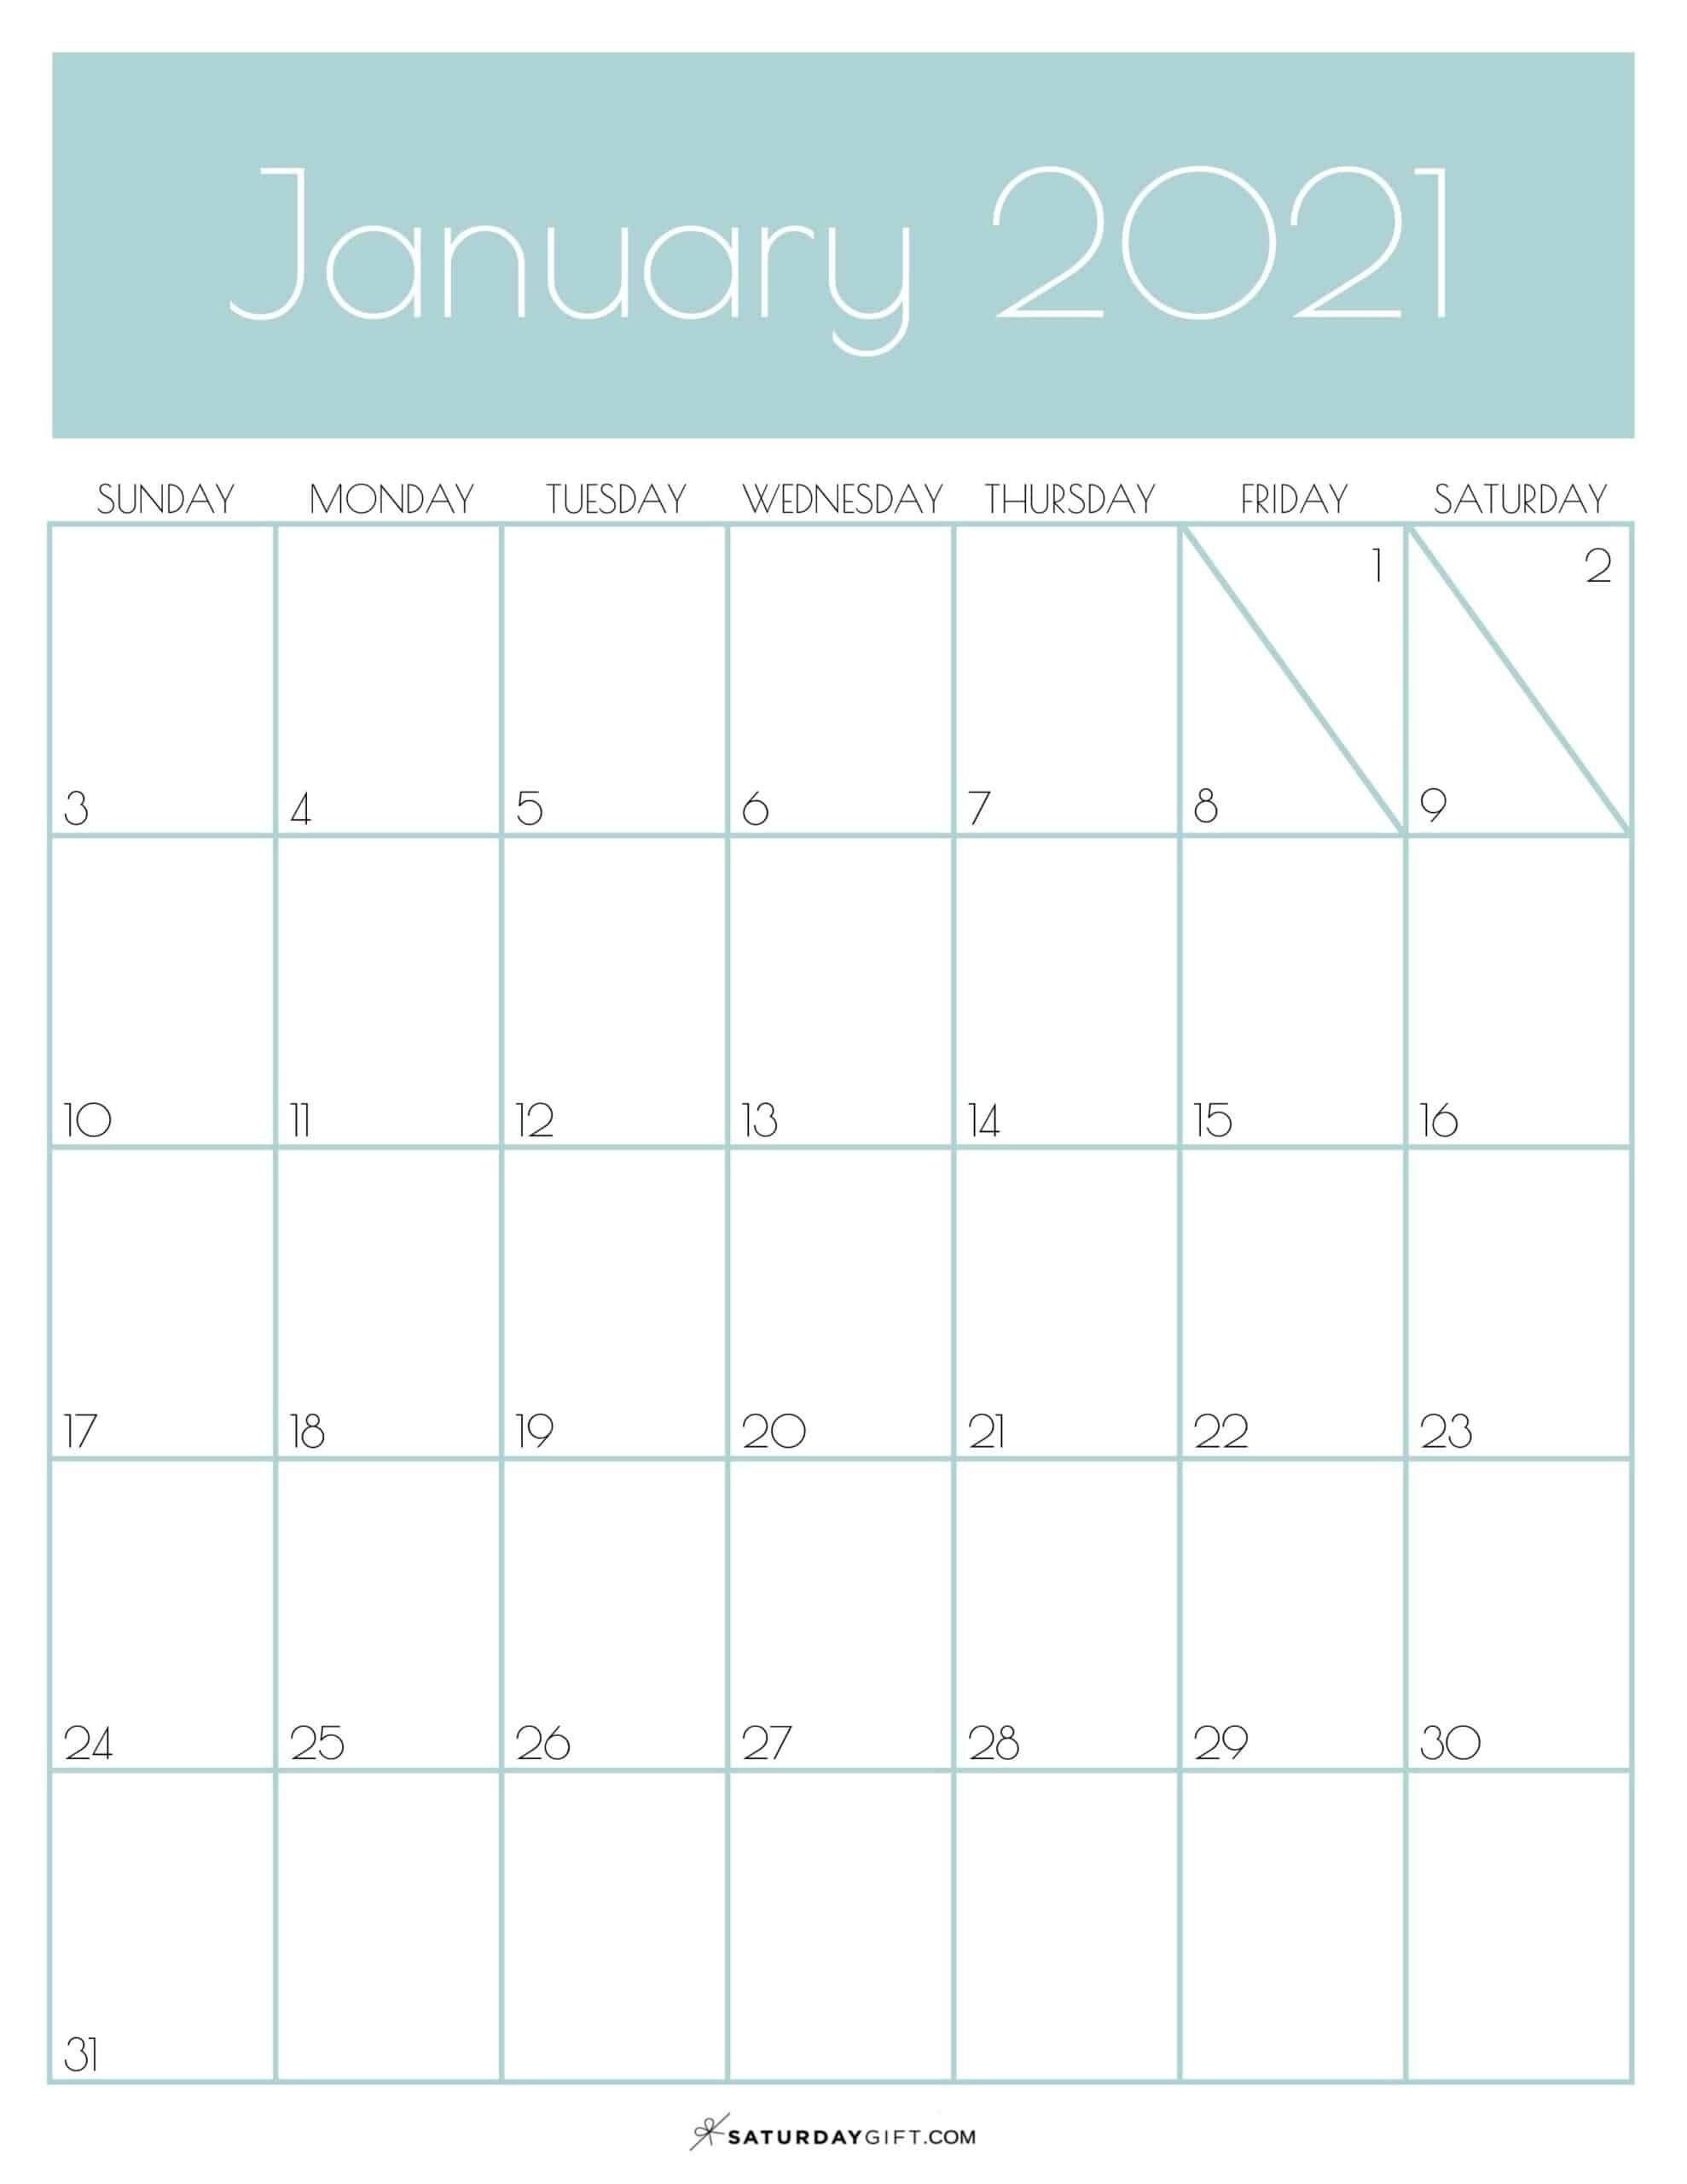 Cute & Free Printable January 2021 Calendar